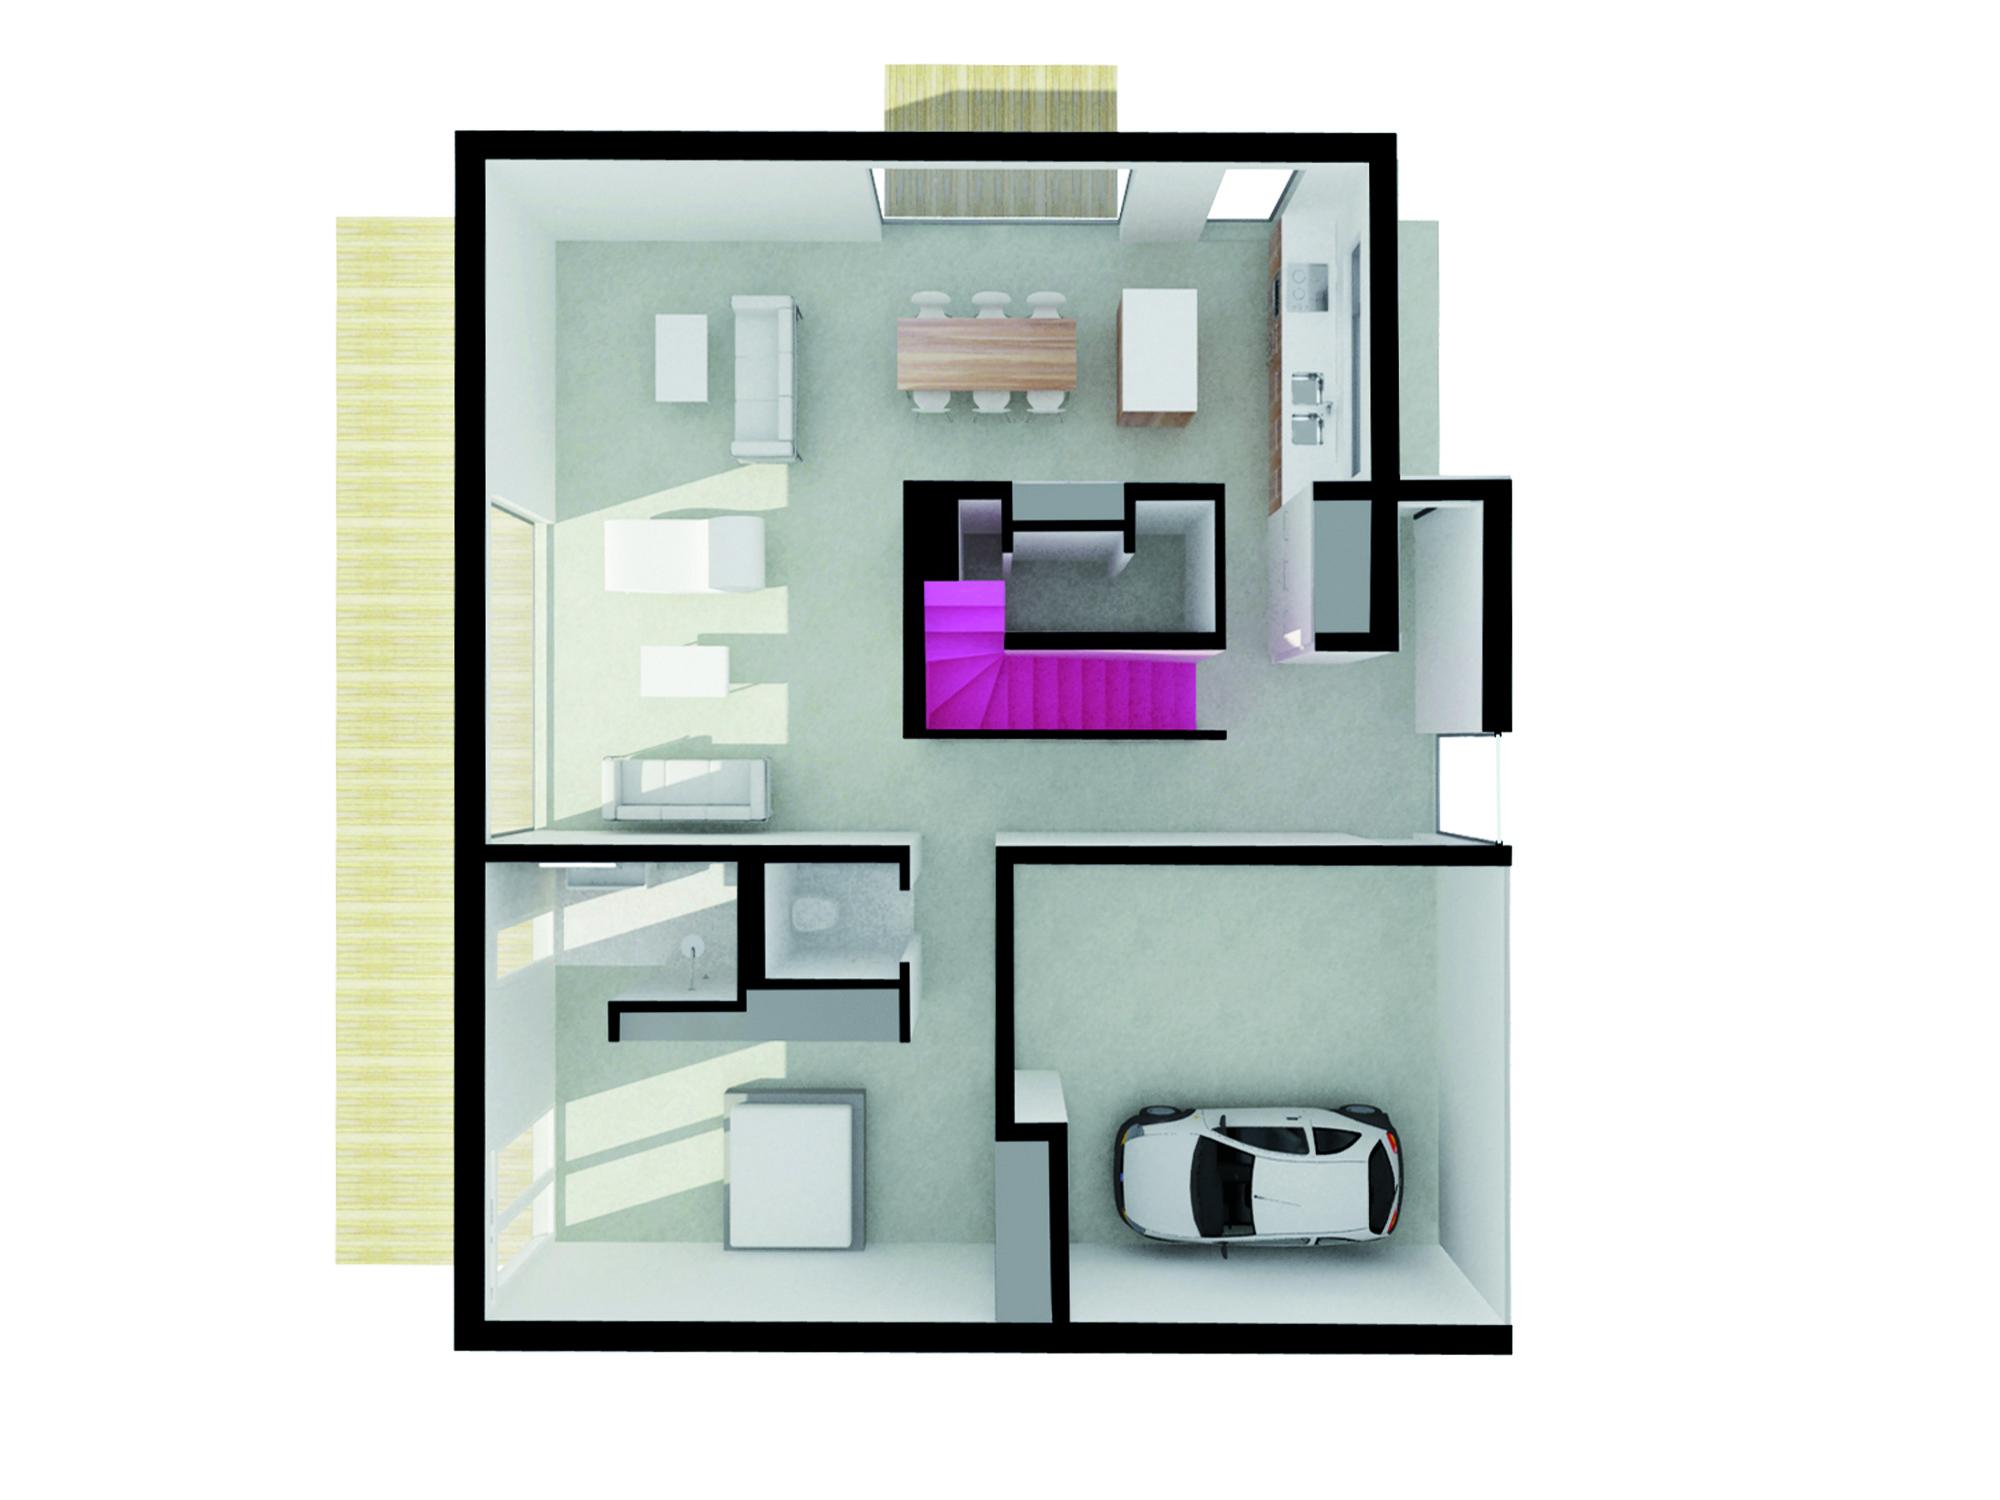 Gallery of Maison 2G / Avenier Cornejo Architectes - 19